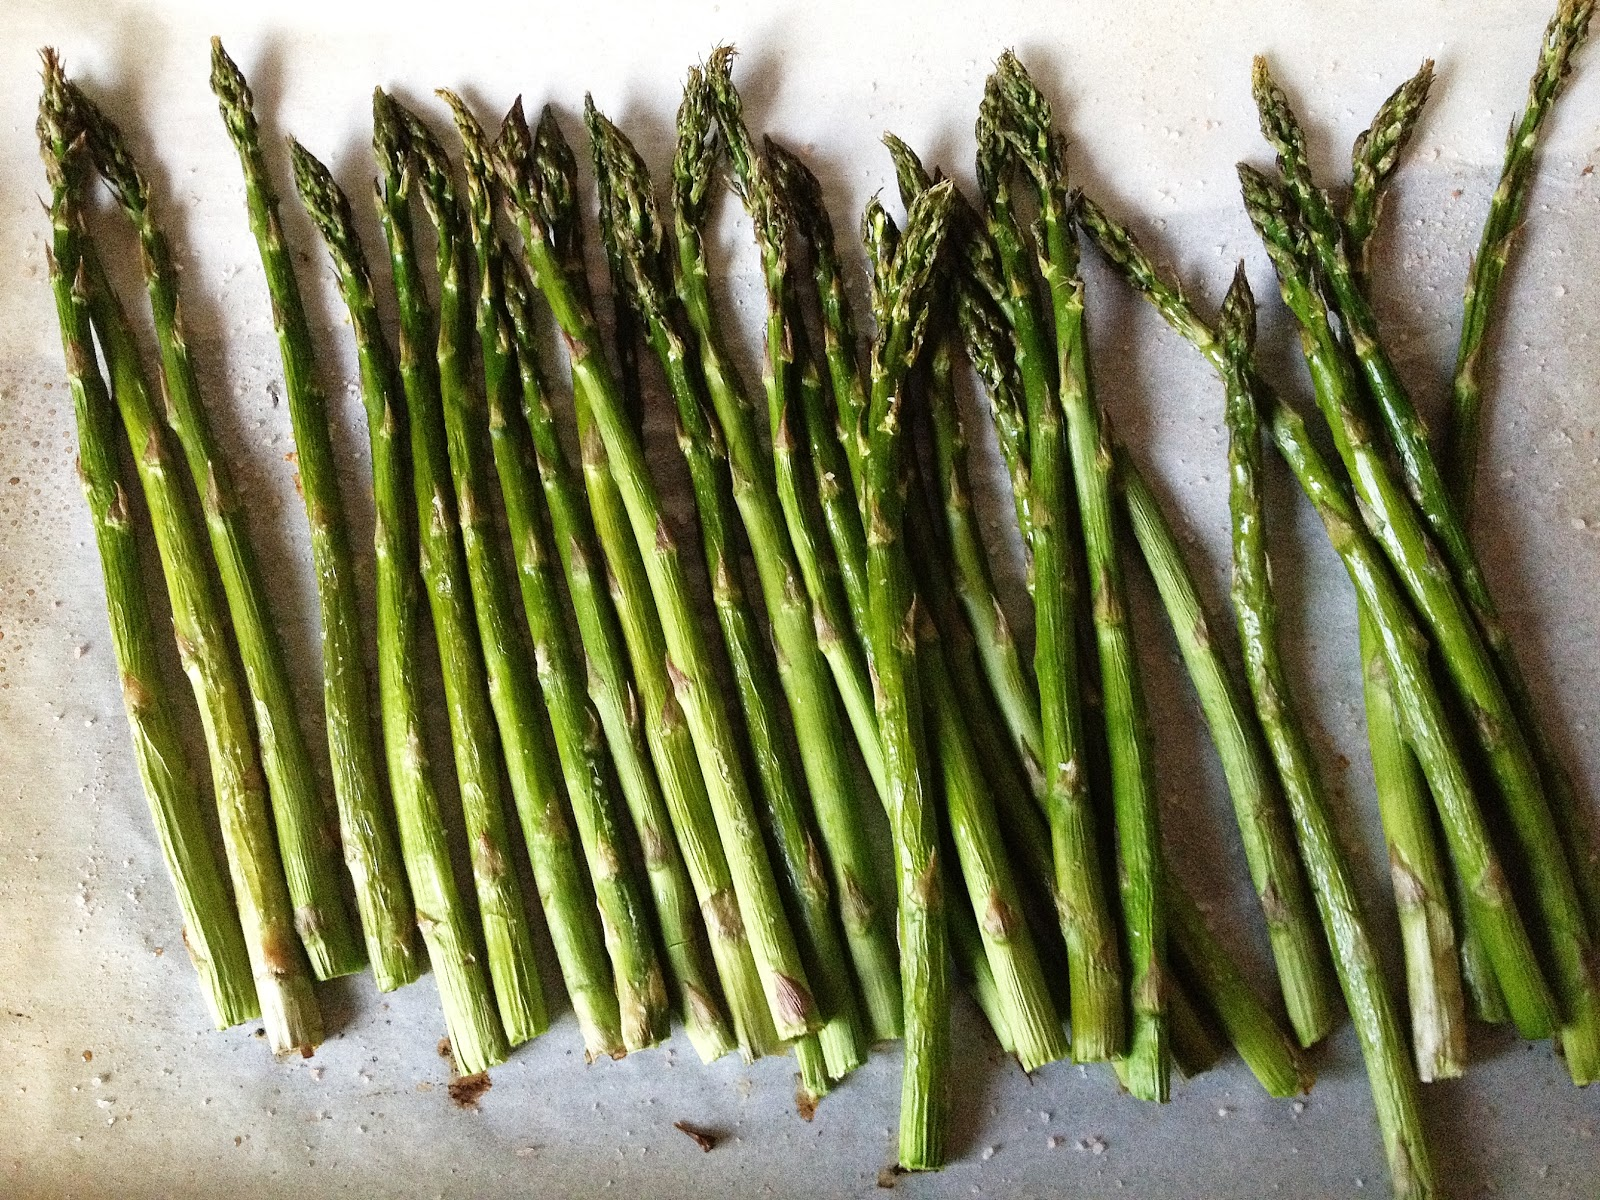 Salty, Crispy, Roasted Asparagus & Making Ryan Gosling Smile